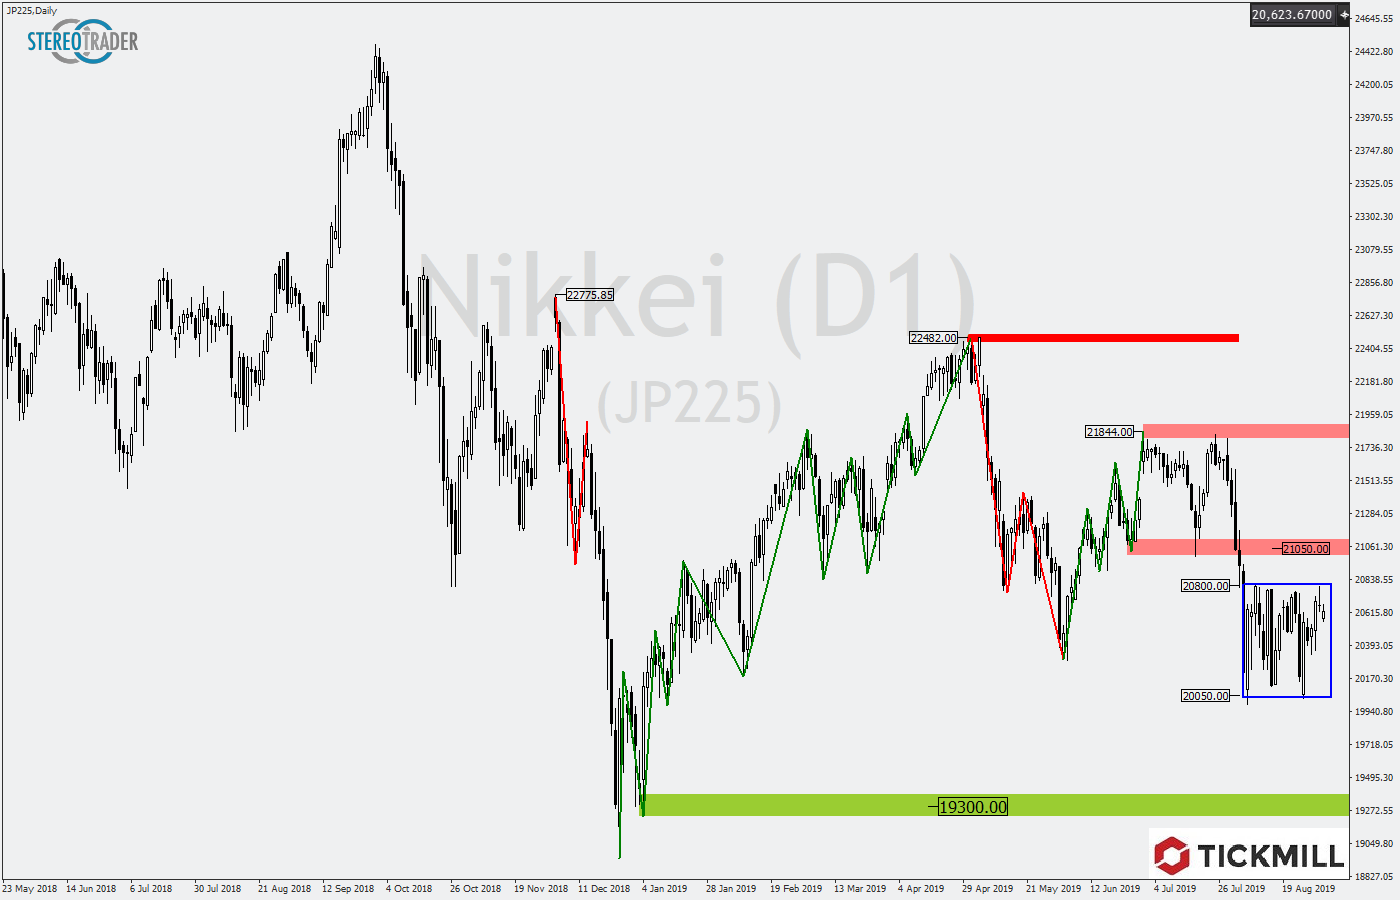 Tickmill-Analyse: Nikkei mit Tradingrange im August